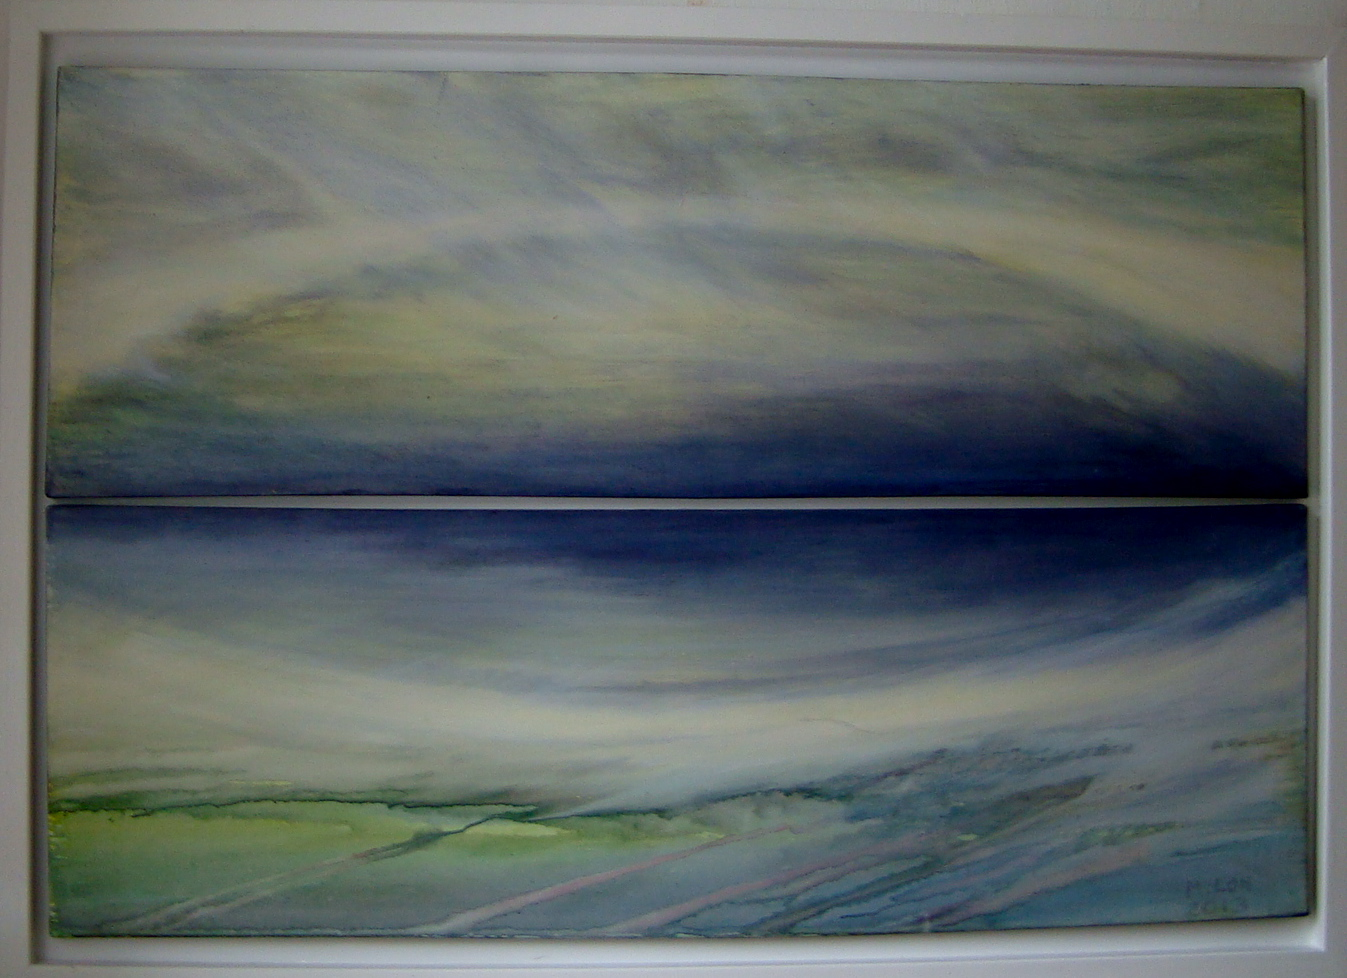 Spiegelung, 2013, Acryl auf Leinwand, 130 x 90 cm